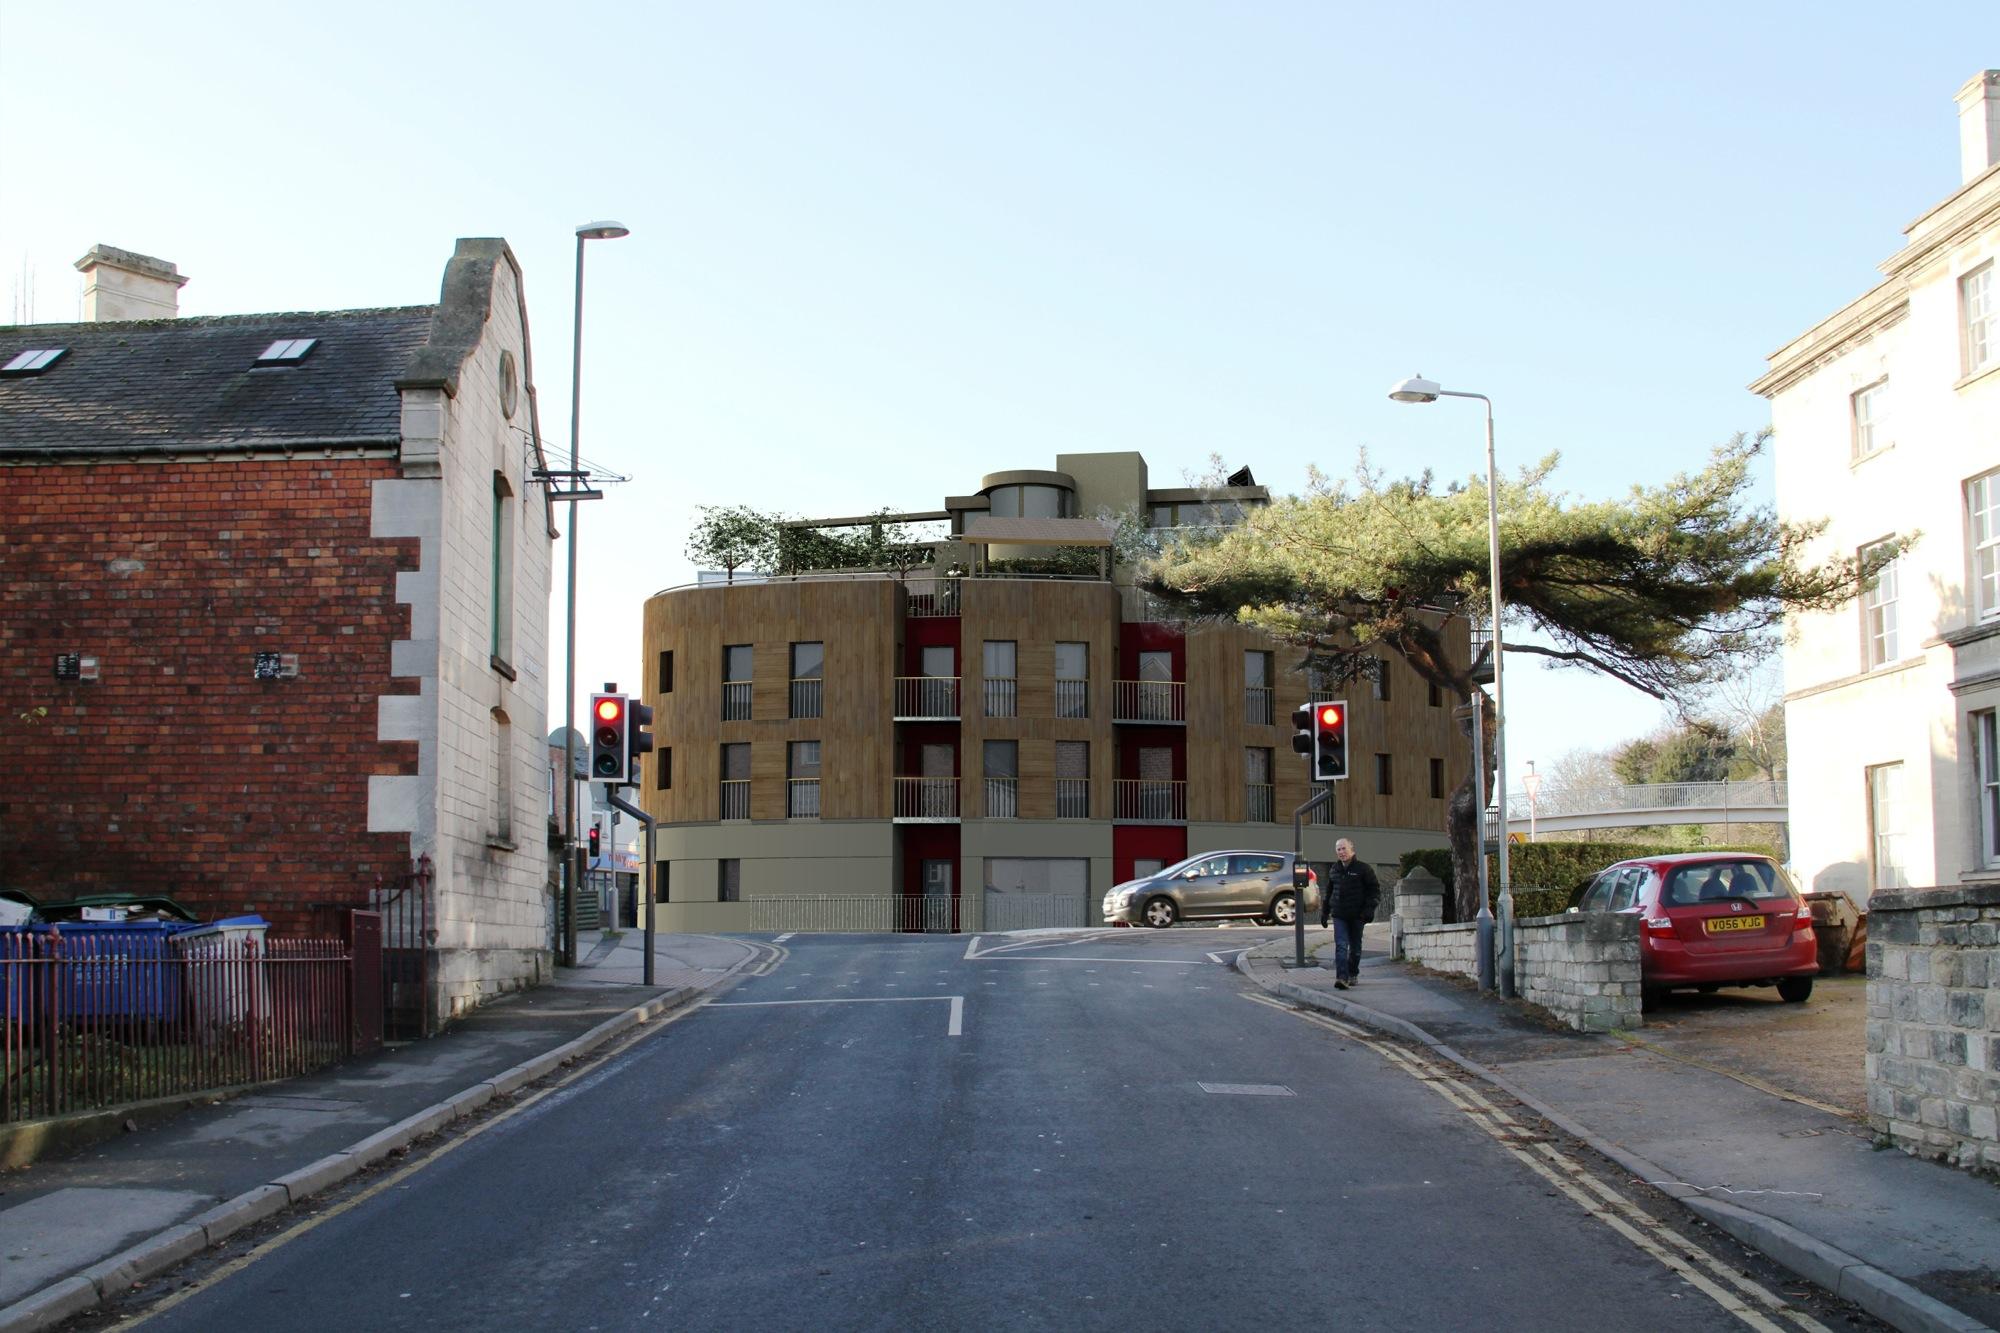 Stroud planning proposal – photomontage